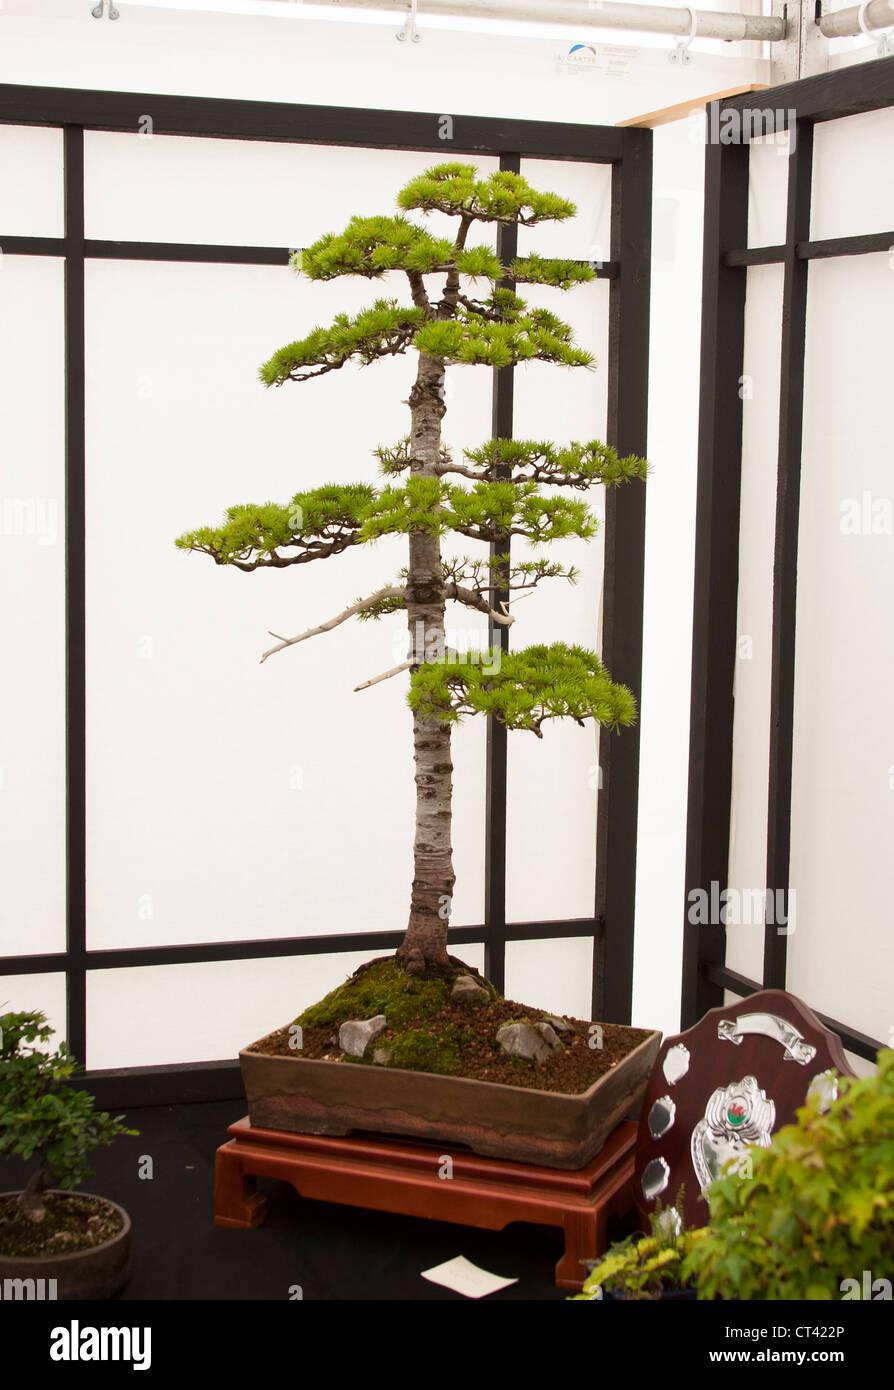 Bonsai tree prize winner displayed at show - Stock Image